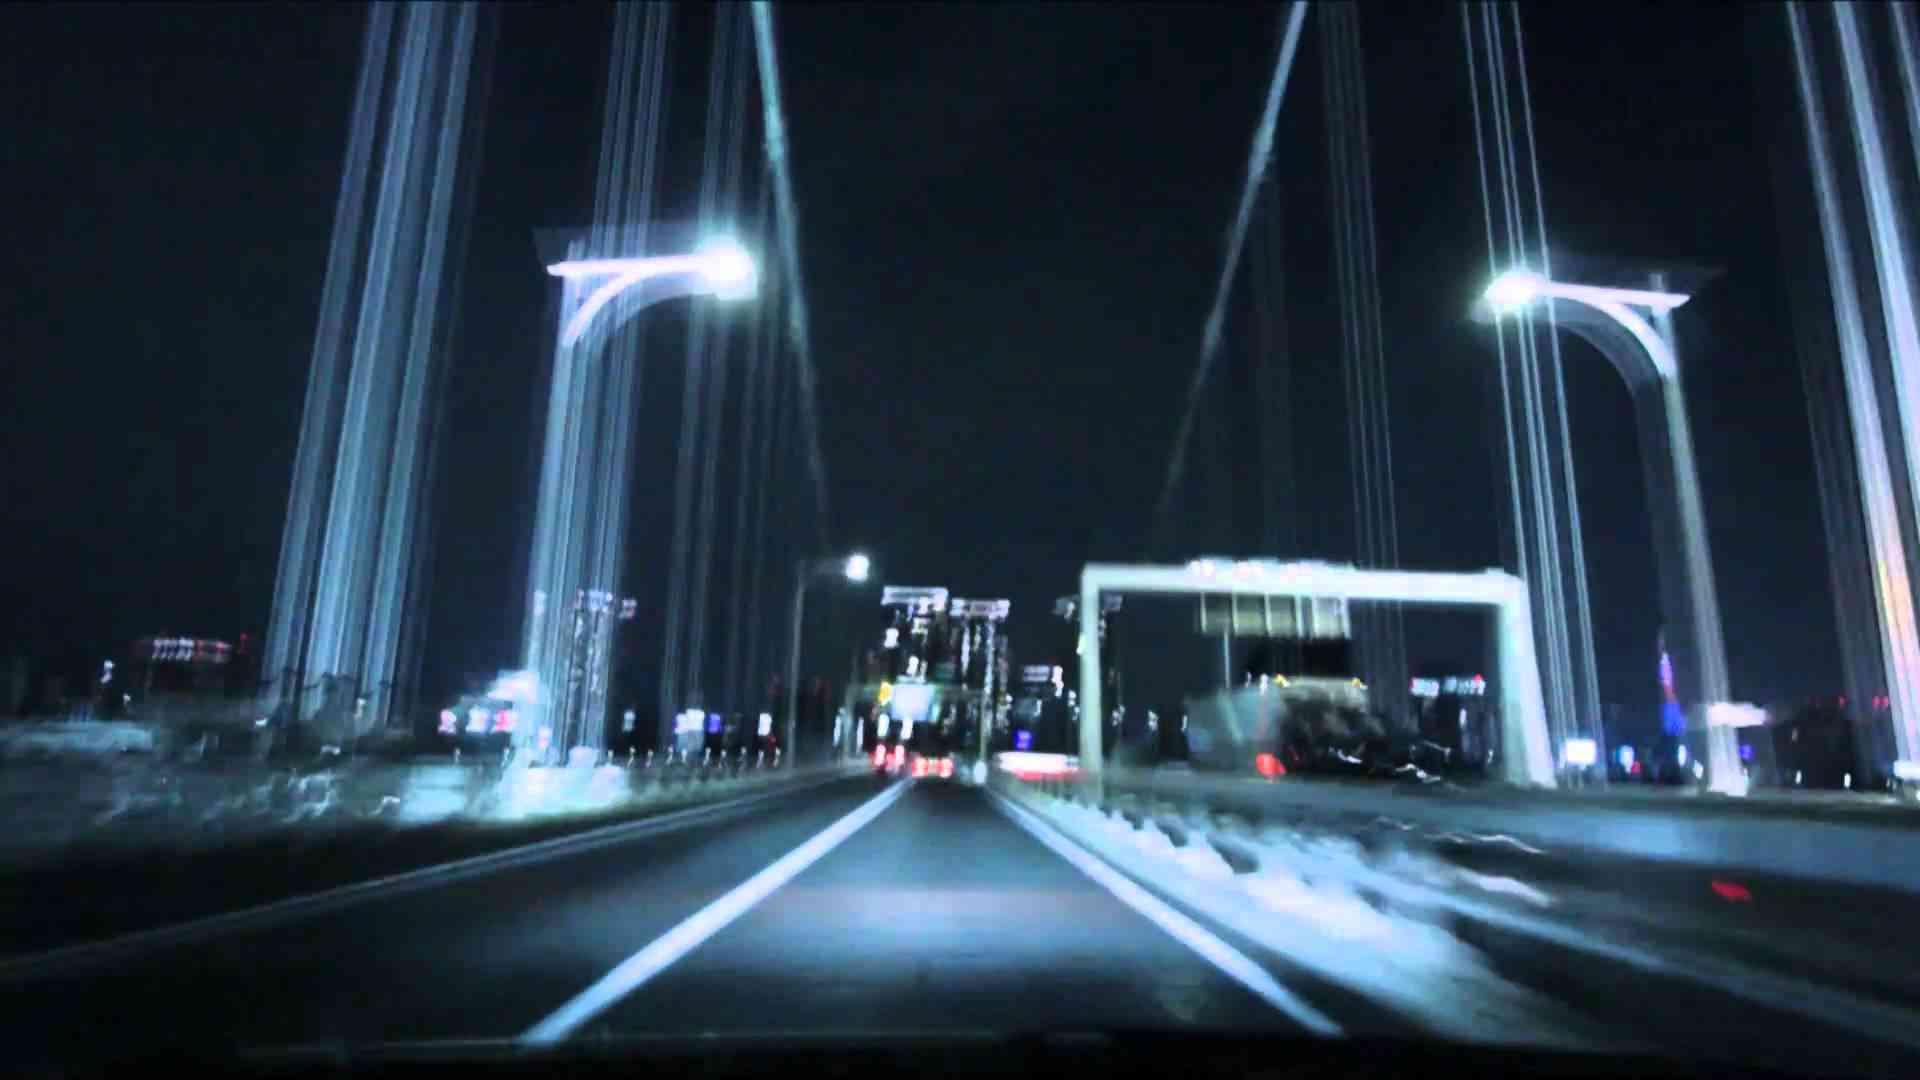 (HD) Night drive in Tokyo 01 -夜の首都高 湾岸線→台場線→C1→渋谷線- - YouTube